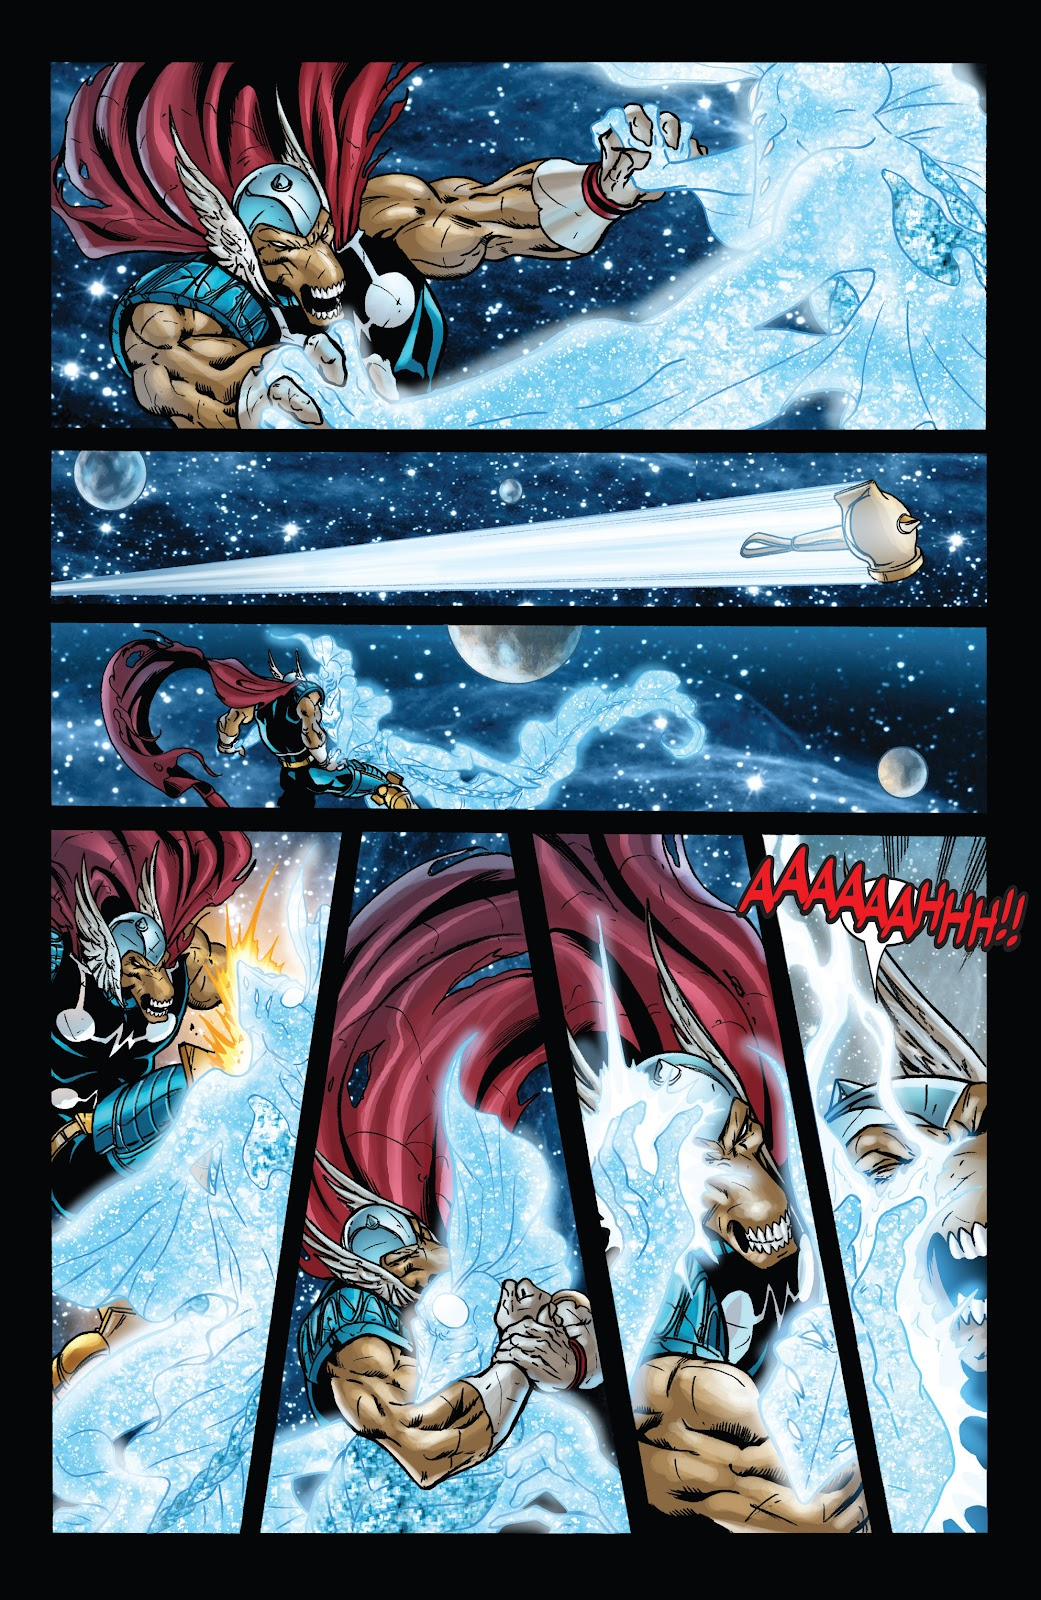 Read online Thor: Ragnaroks comic -  Issue # TPB (Part 4) - 21